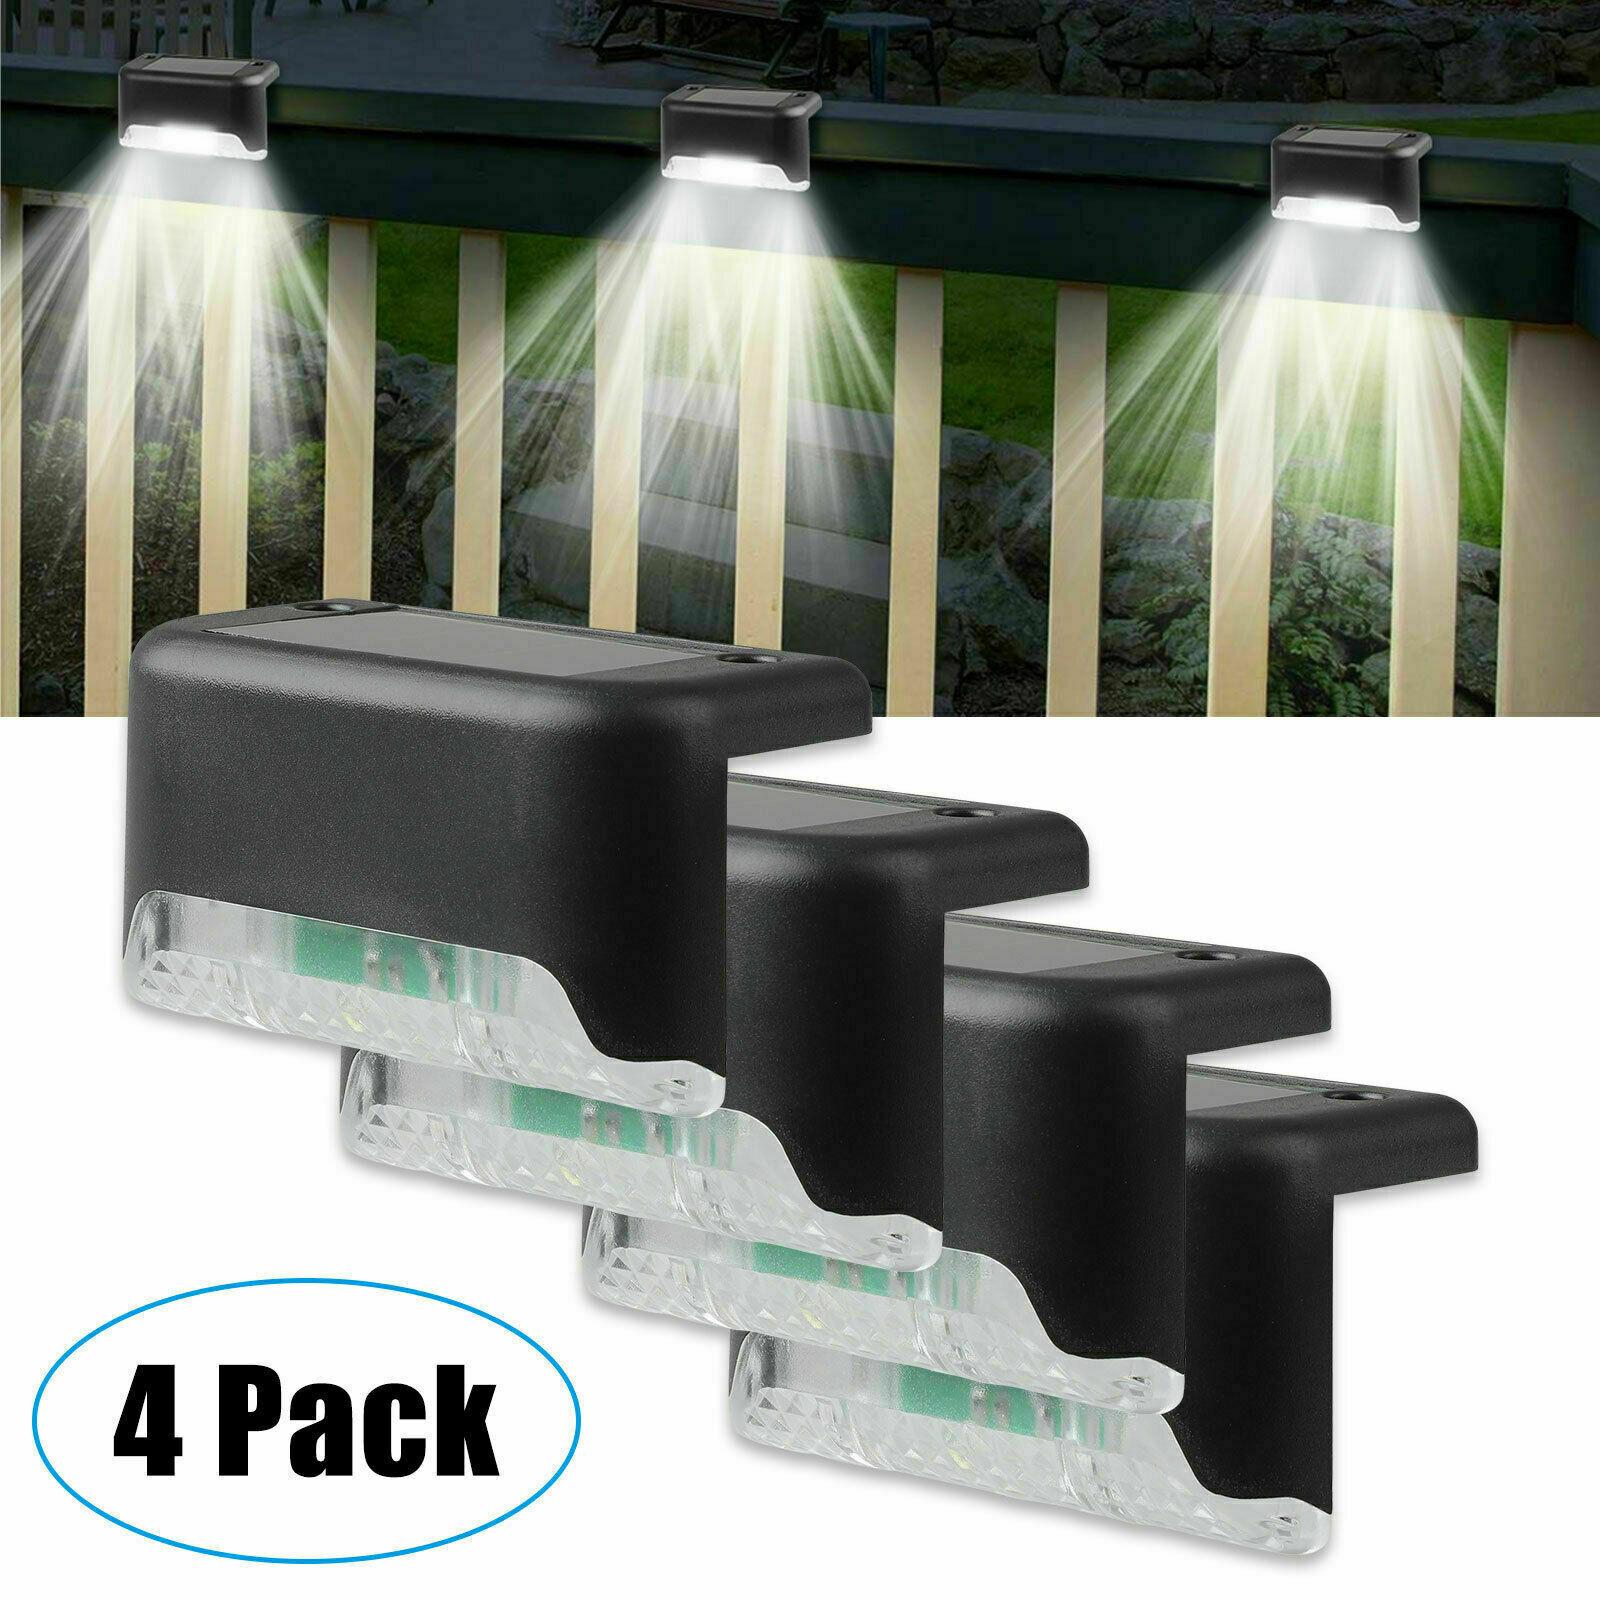 4 Solar LED Bright Deck Lights Outdoor Garden Patio Railing Decks Path Lighting Home & Garden